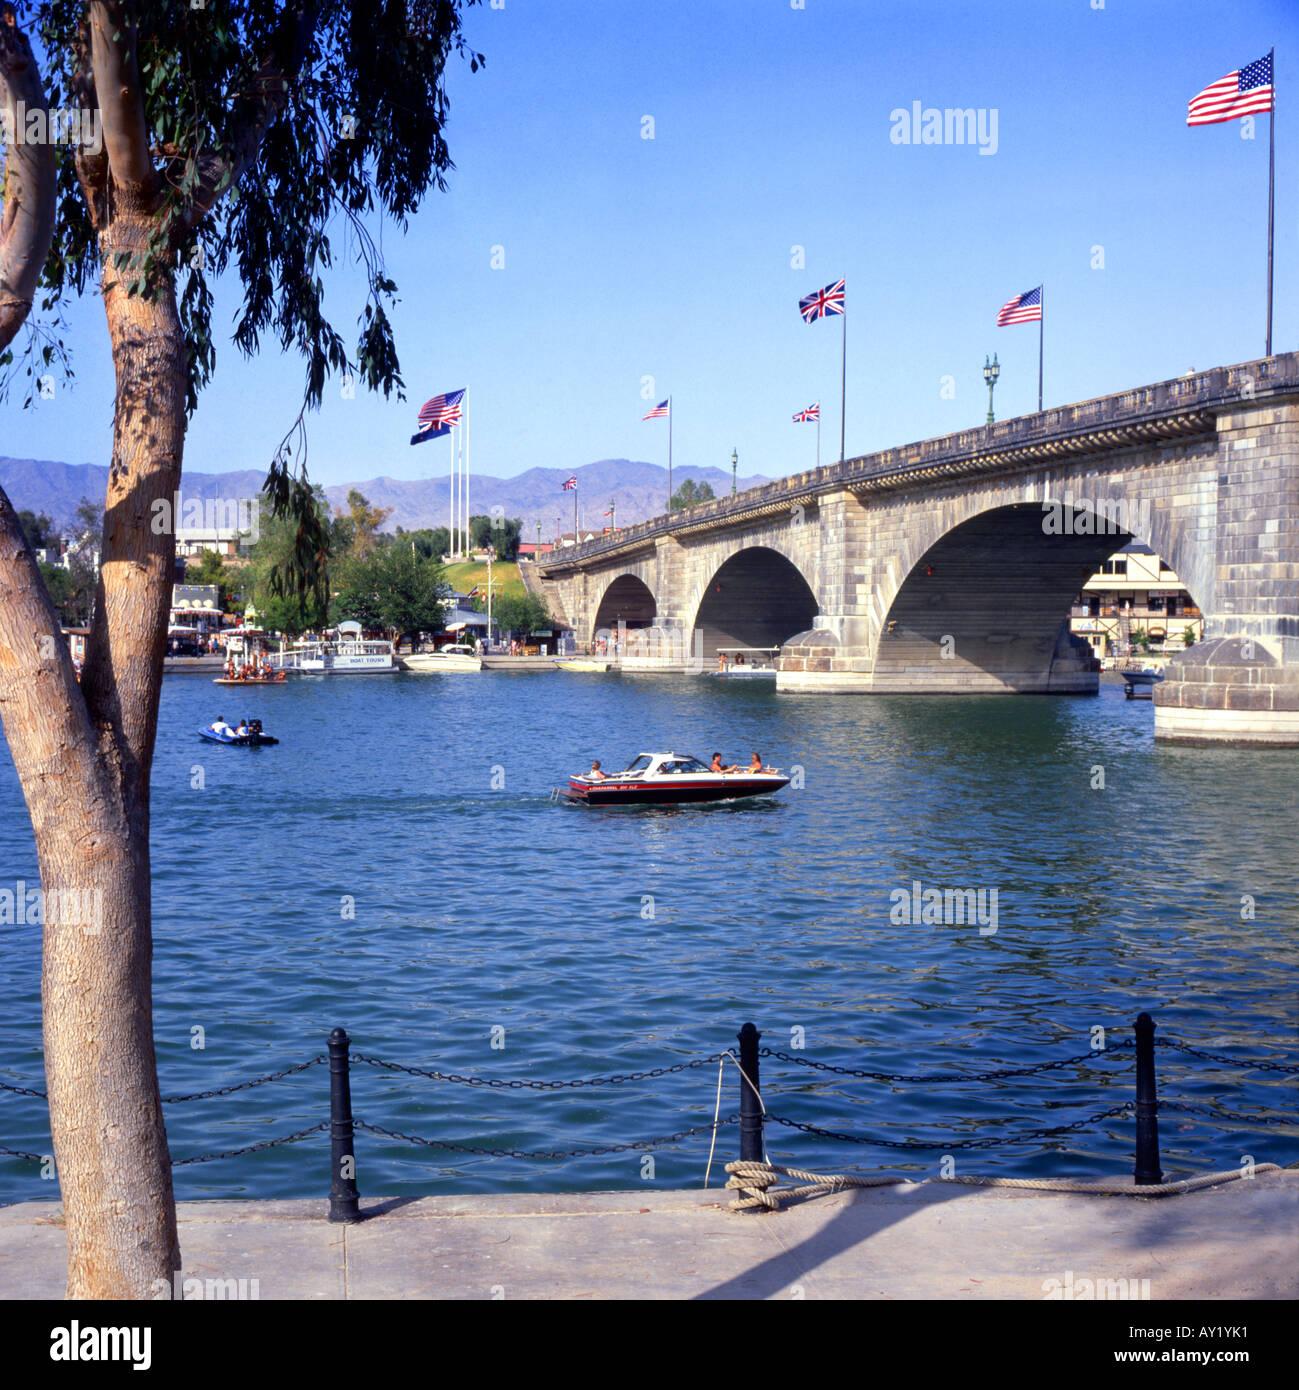 The Original London Bridge Now Spanning Lake Havasu In Arizona Usa Stock Photo Alamy